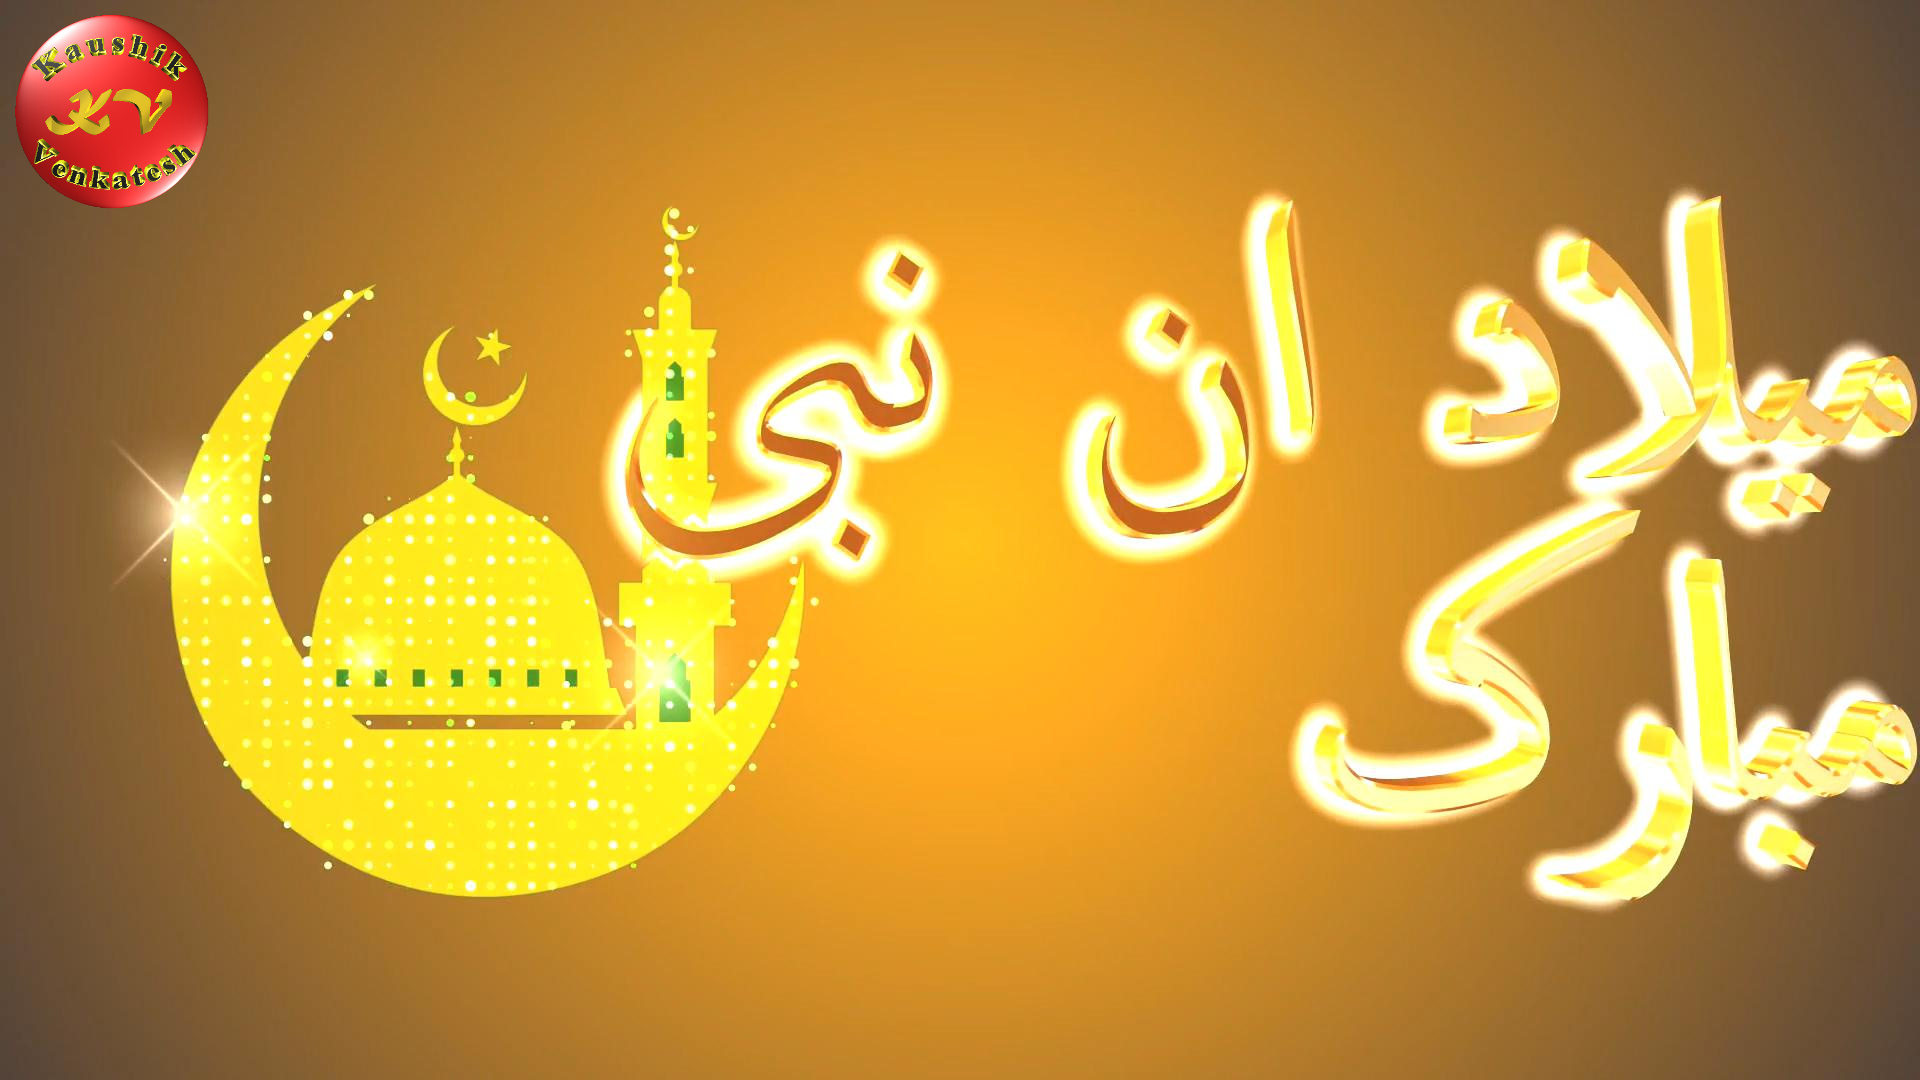 Eid Milad Wishes in Urdu